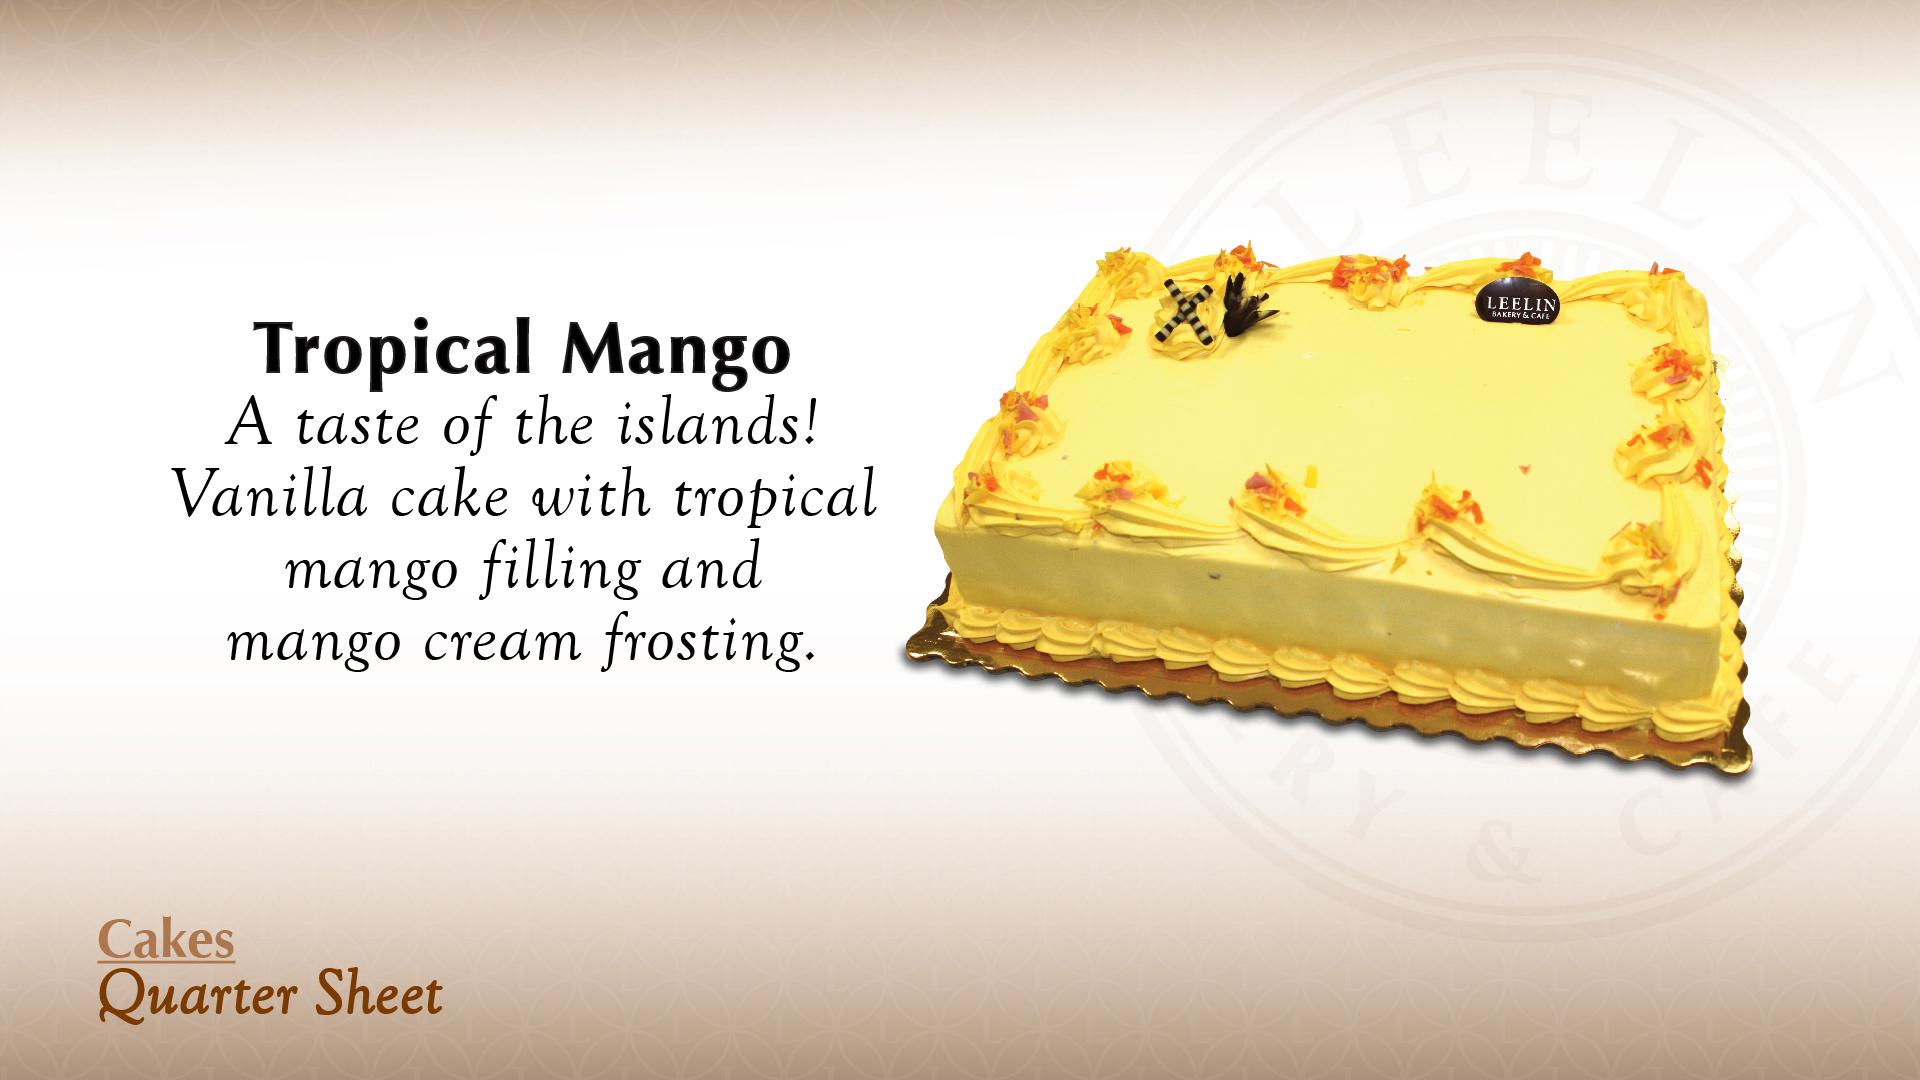 046 Tropical Mango Quarter Sheet 1920x1080.jpg